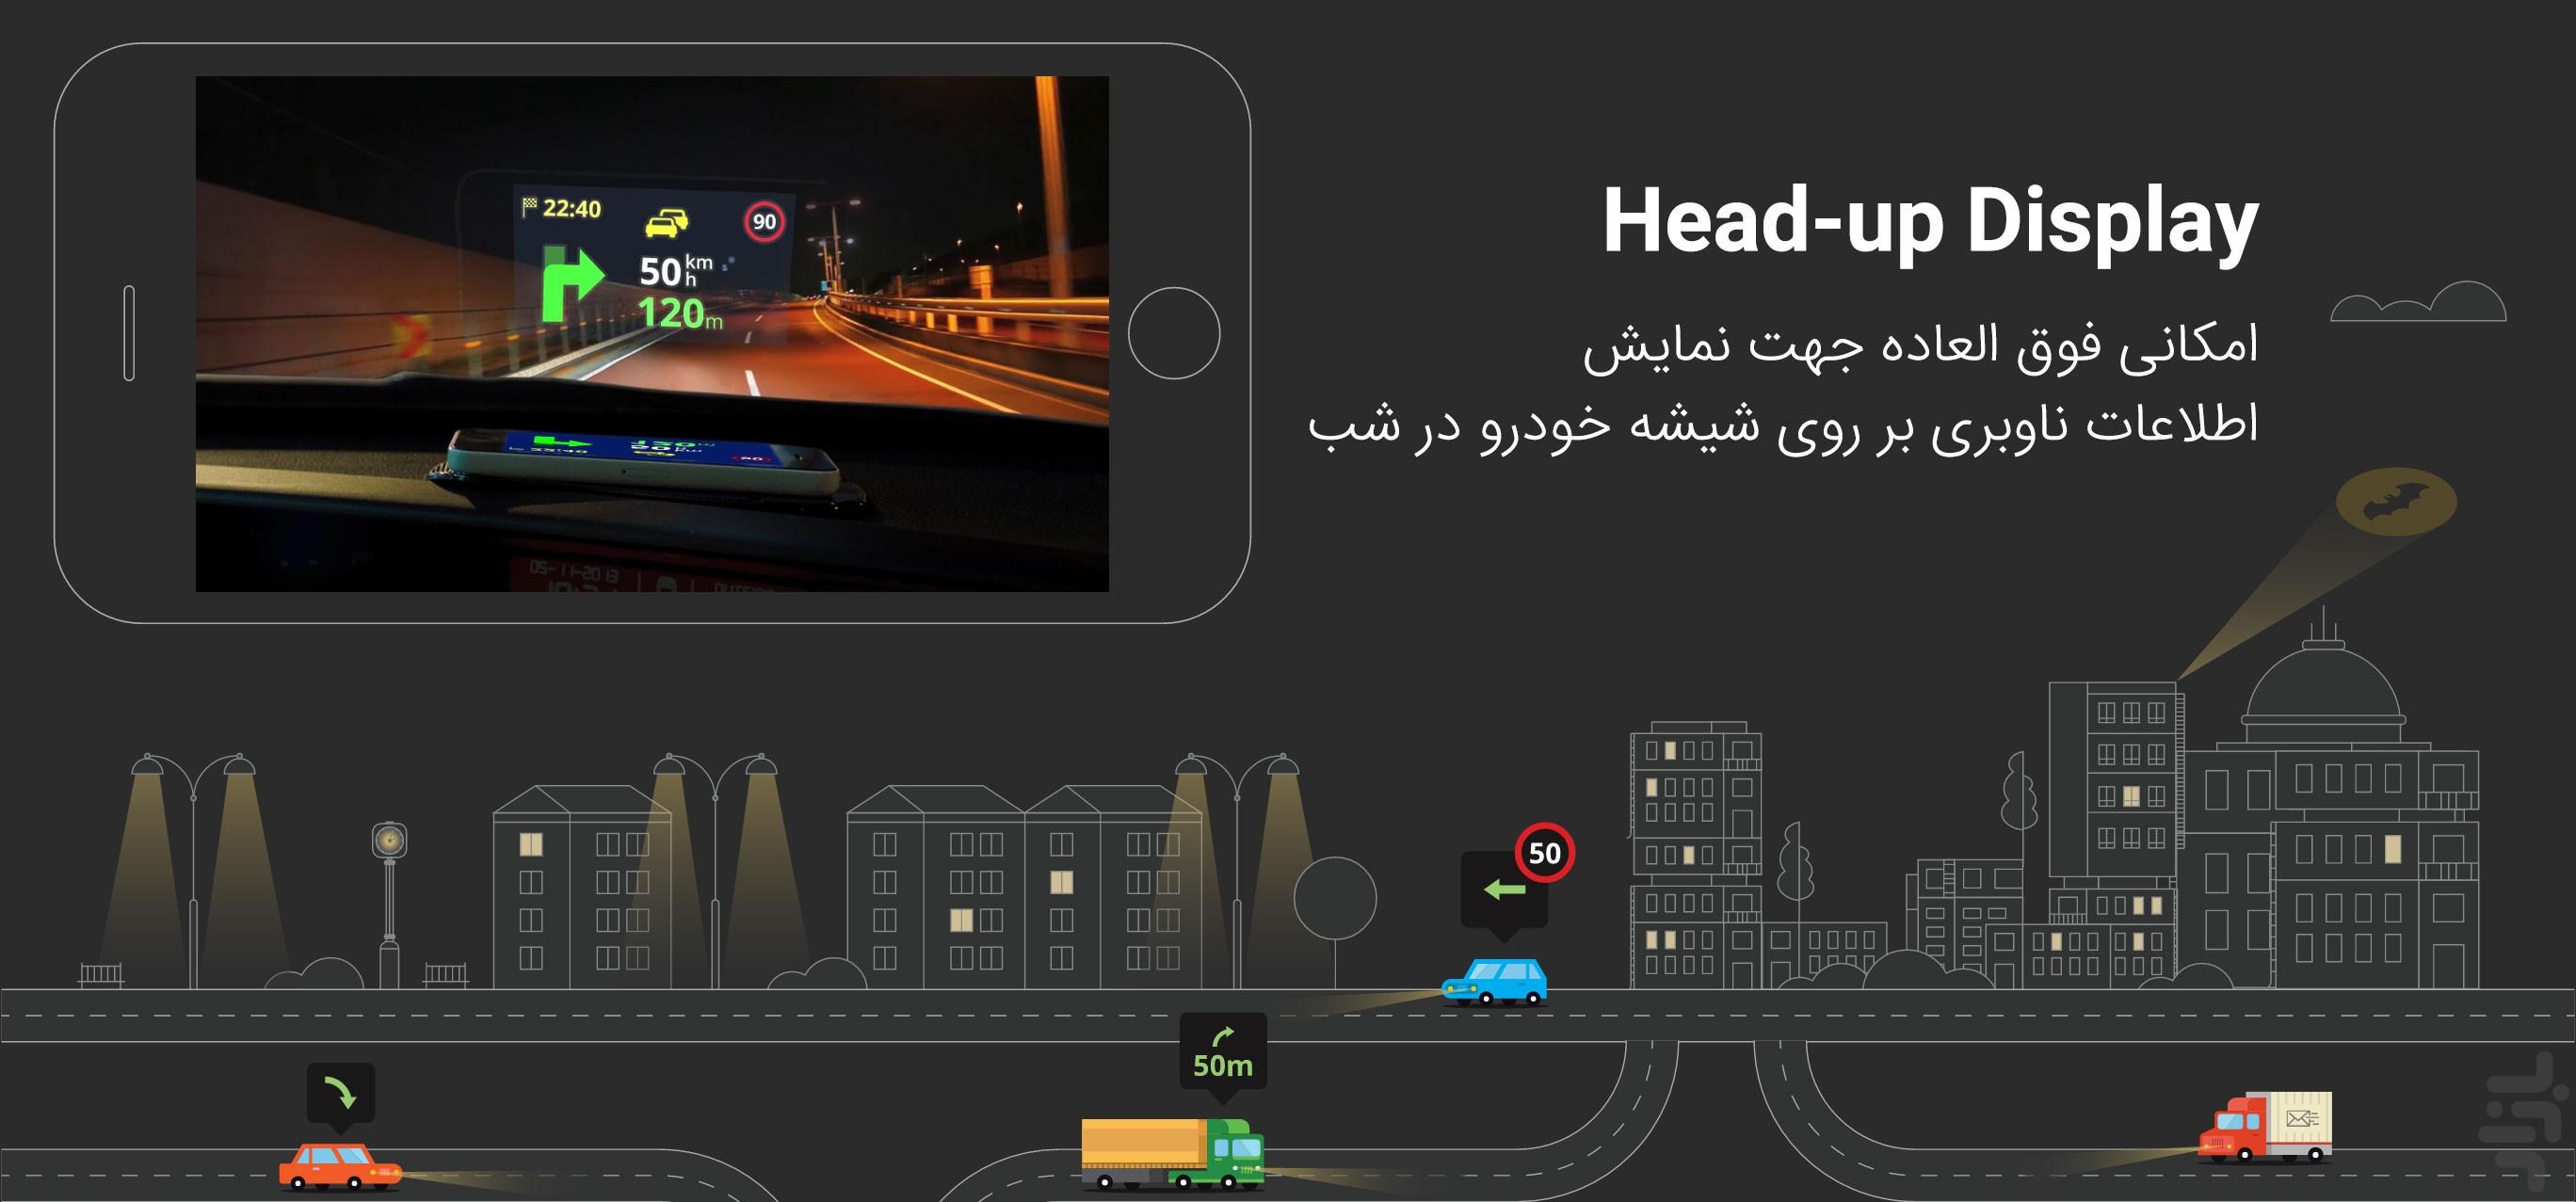 مسیریاب سایجیک طلایی for Android - Download   Cafe Bazaar